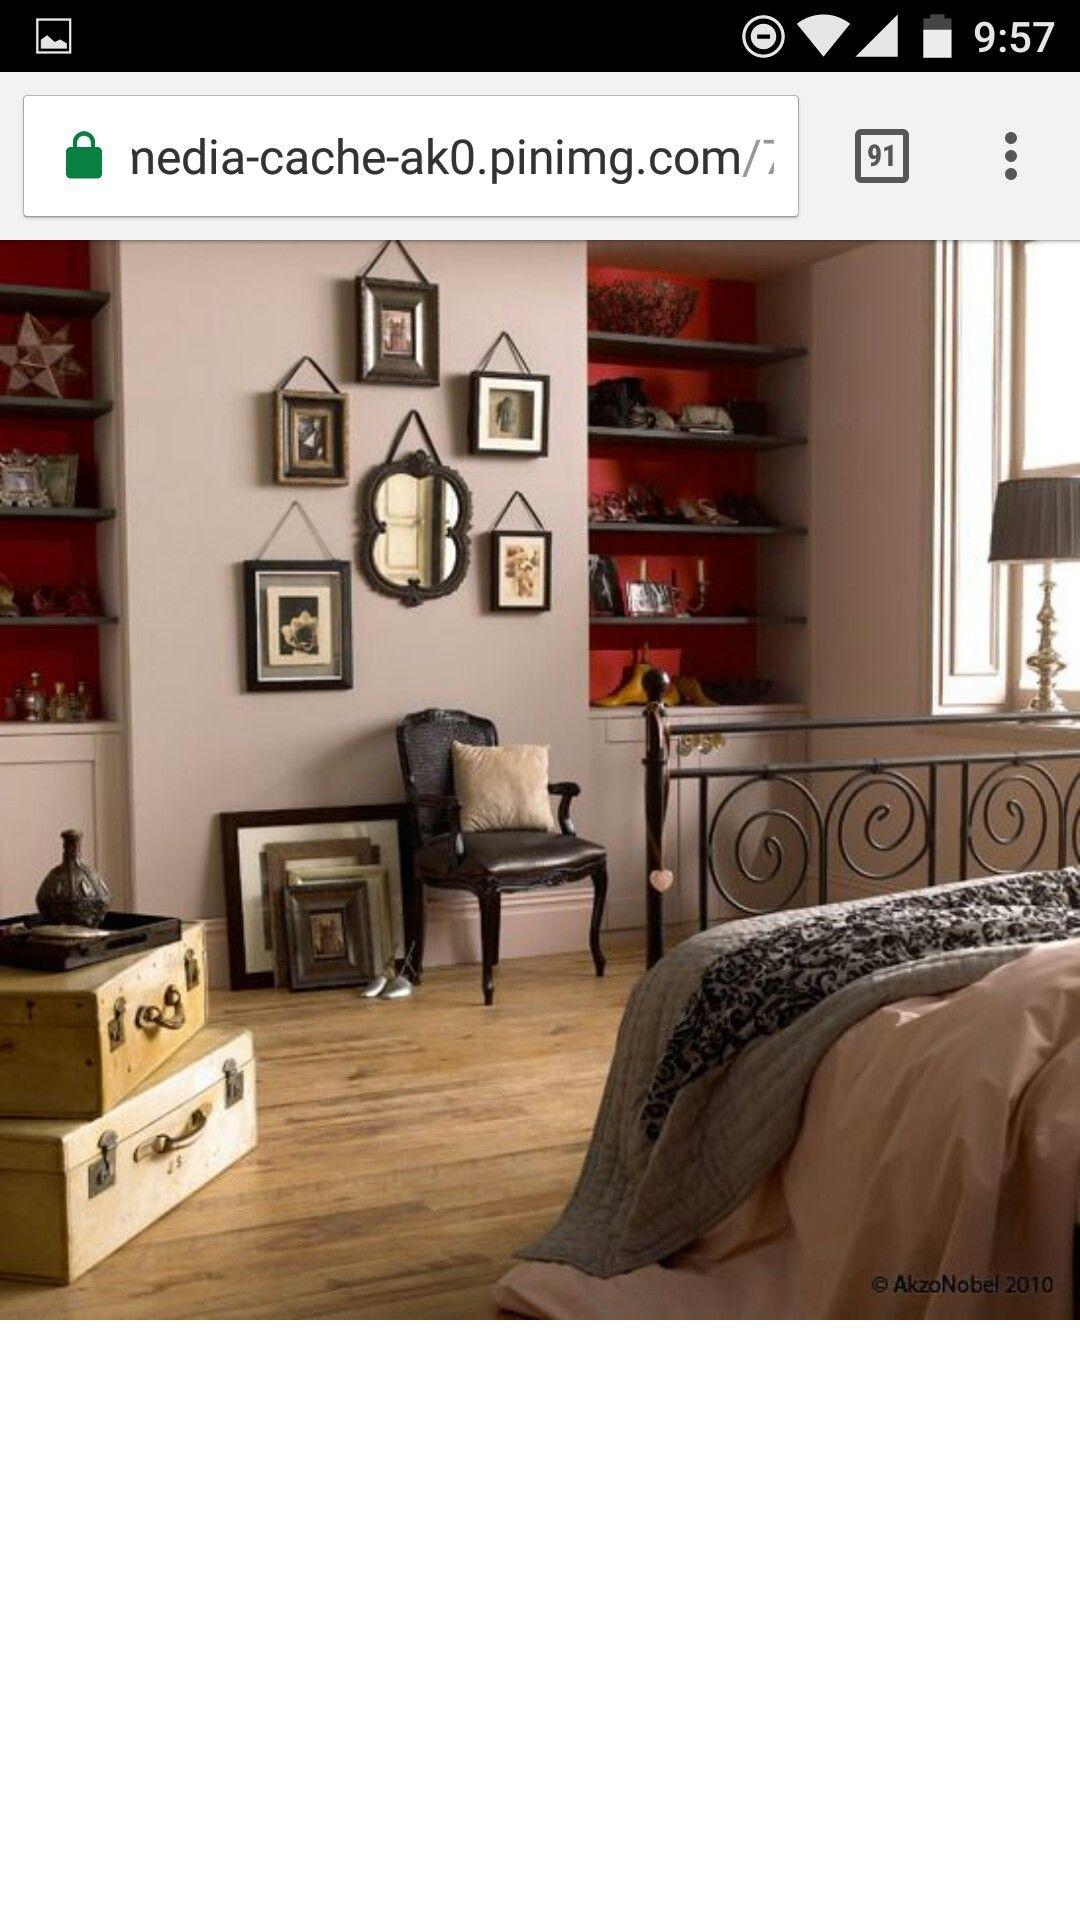 Pin by tara kuriyan on living room pinterest living rooms and room